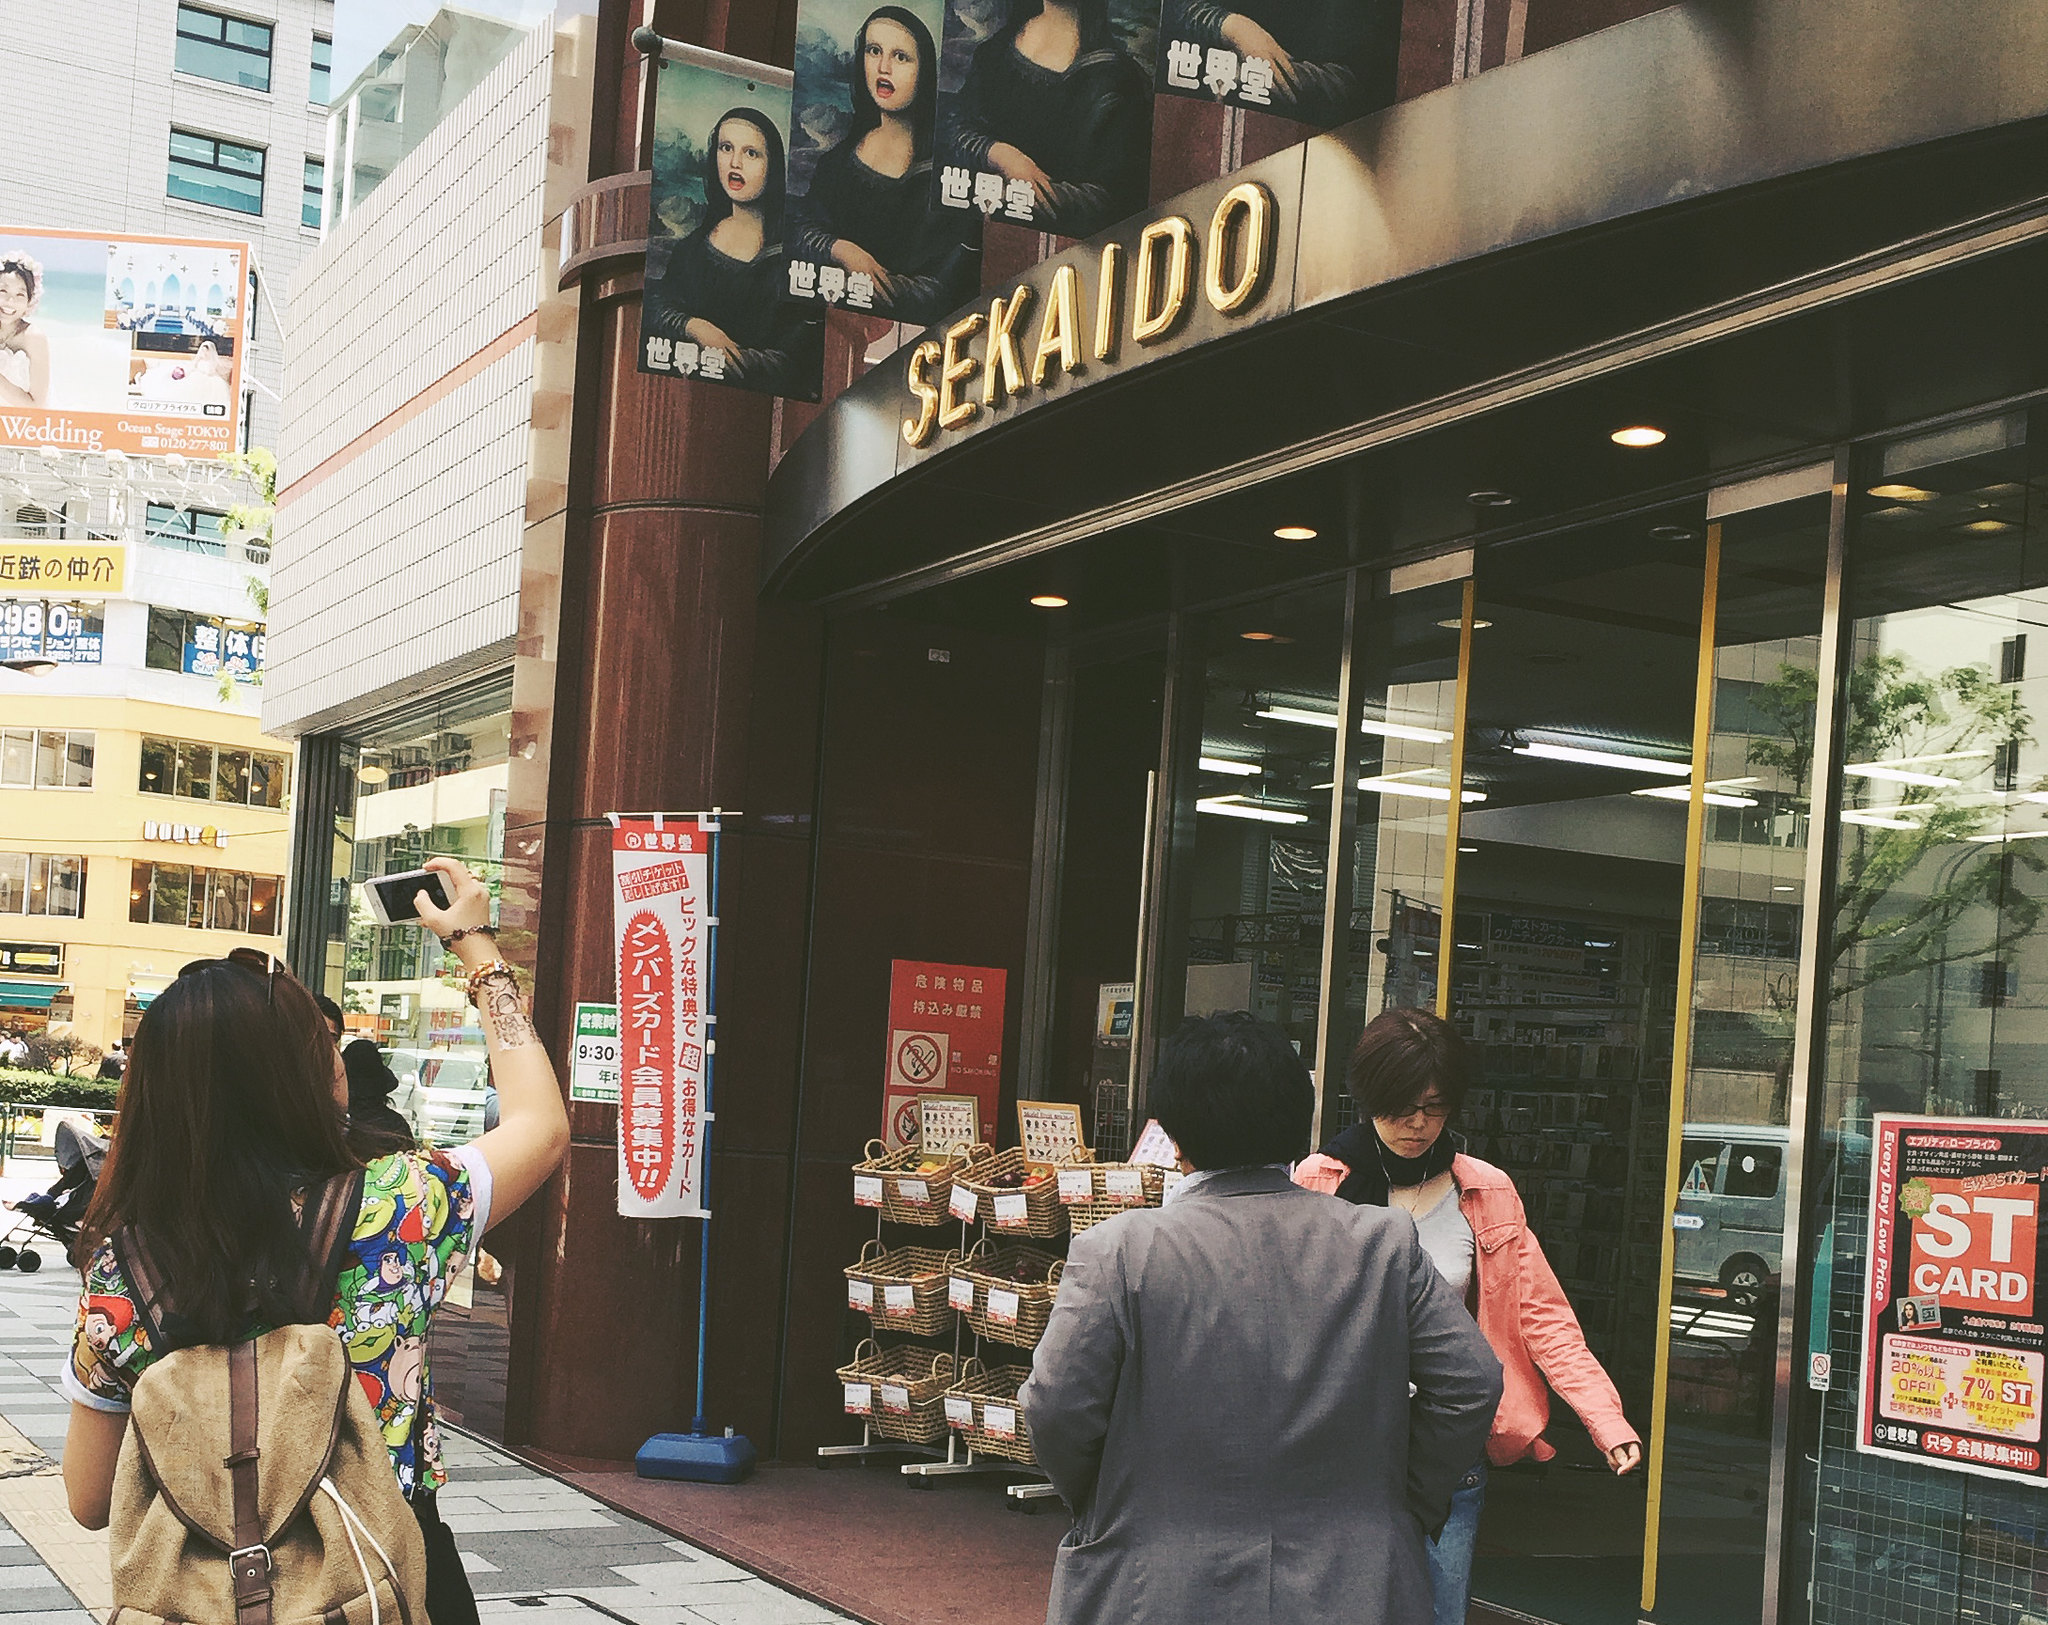 Sekaido2